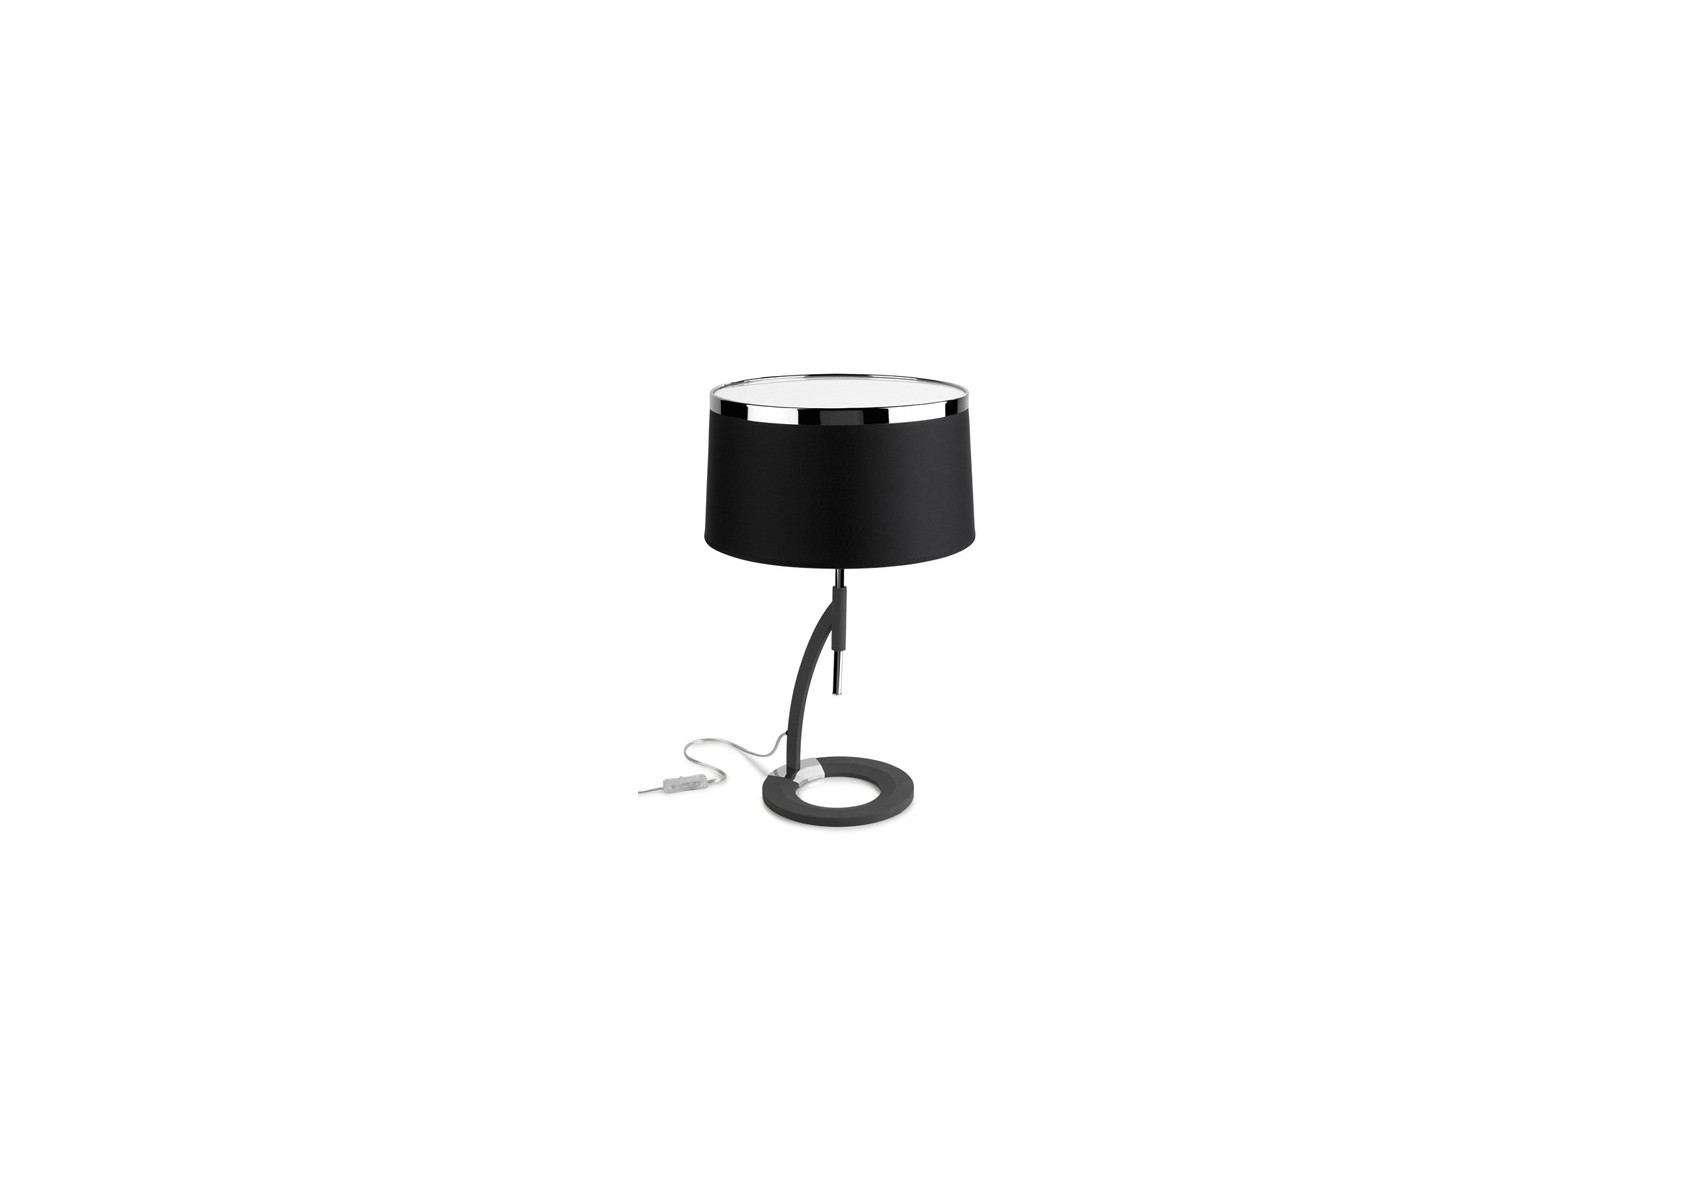 lampe poser design virginia boite design. Black Bedroom Furniture Sets. Home Design Ideas